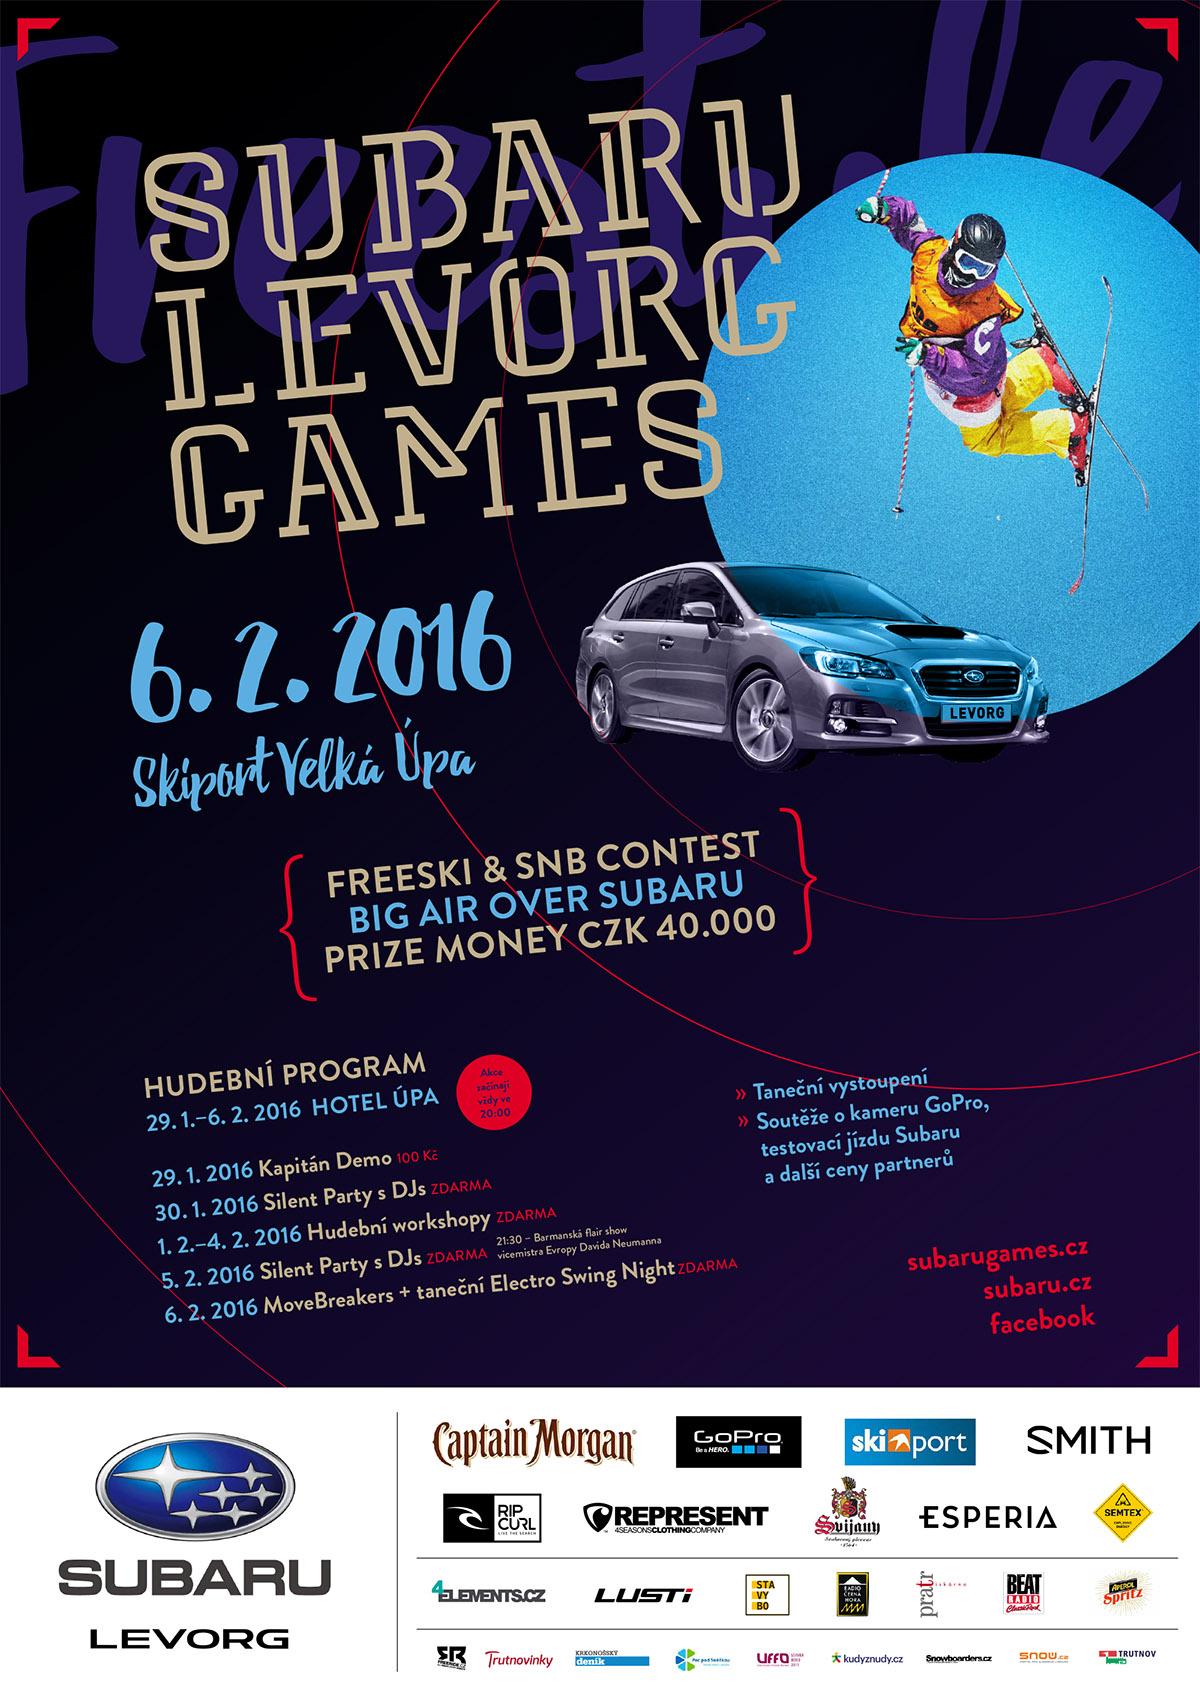 SUBARU LEVORG GAMES